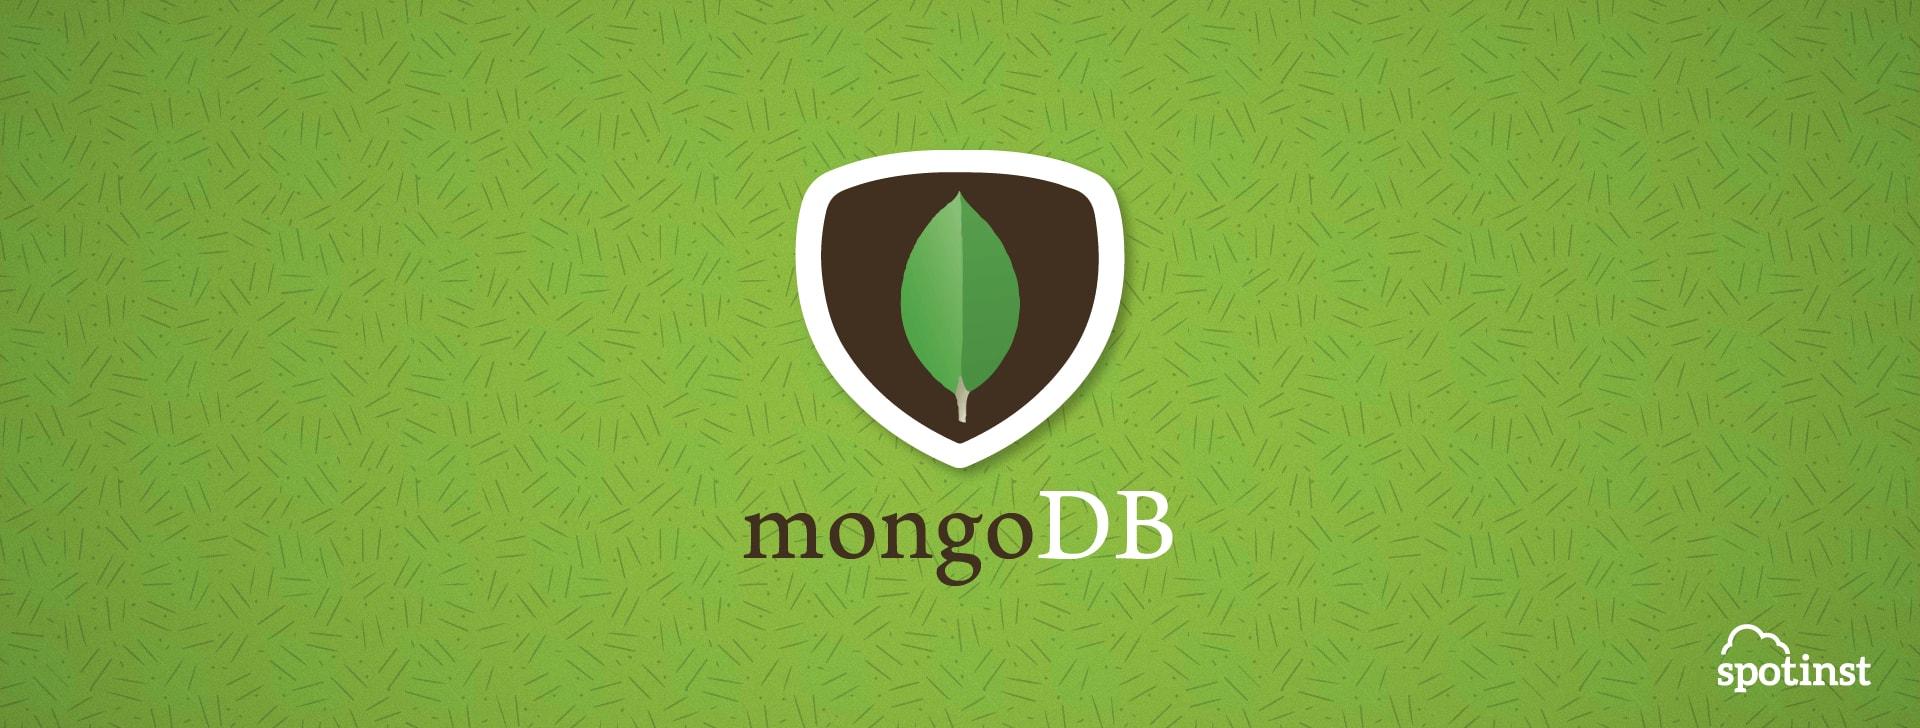 How to Run MongoDB on EC2 Spot Instances